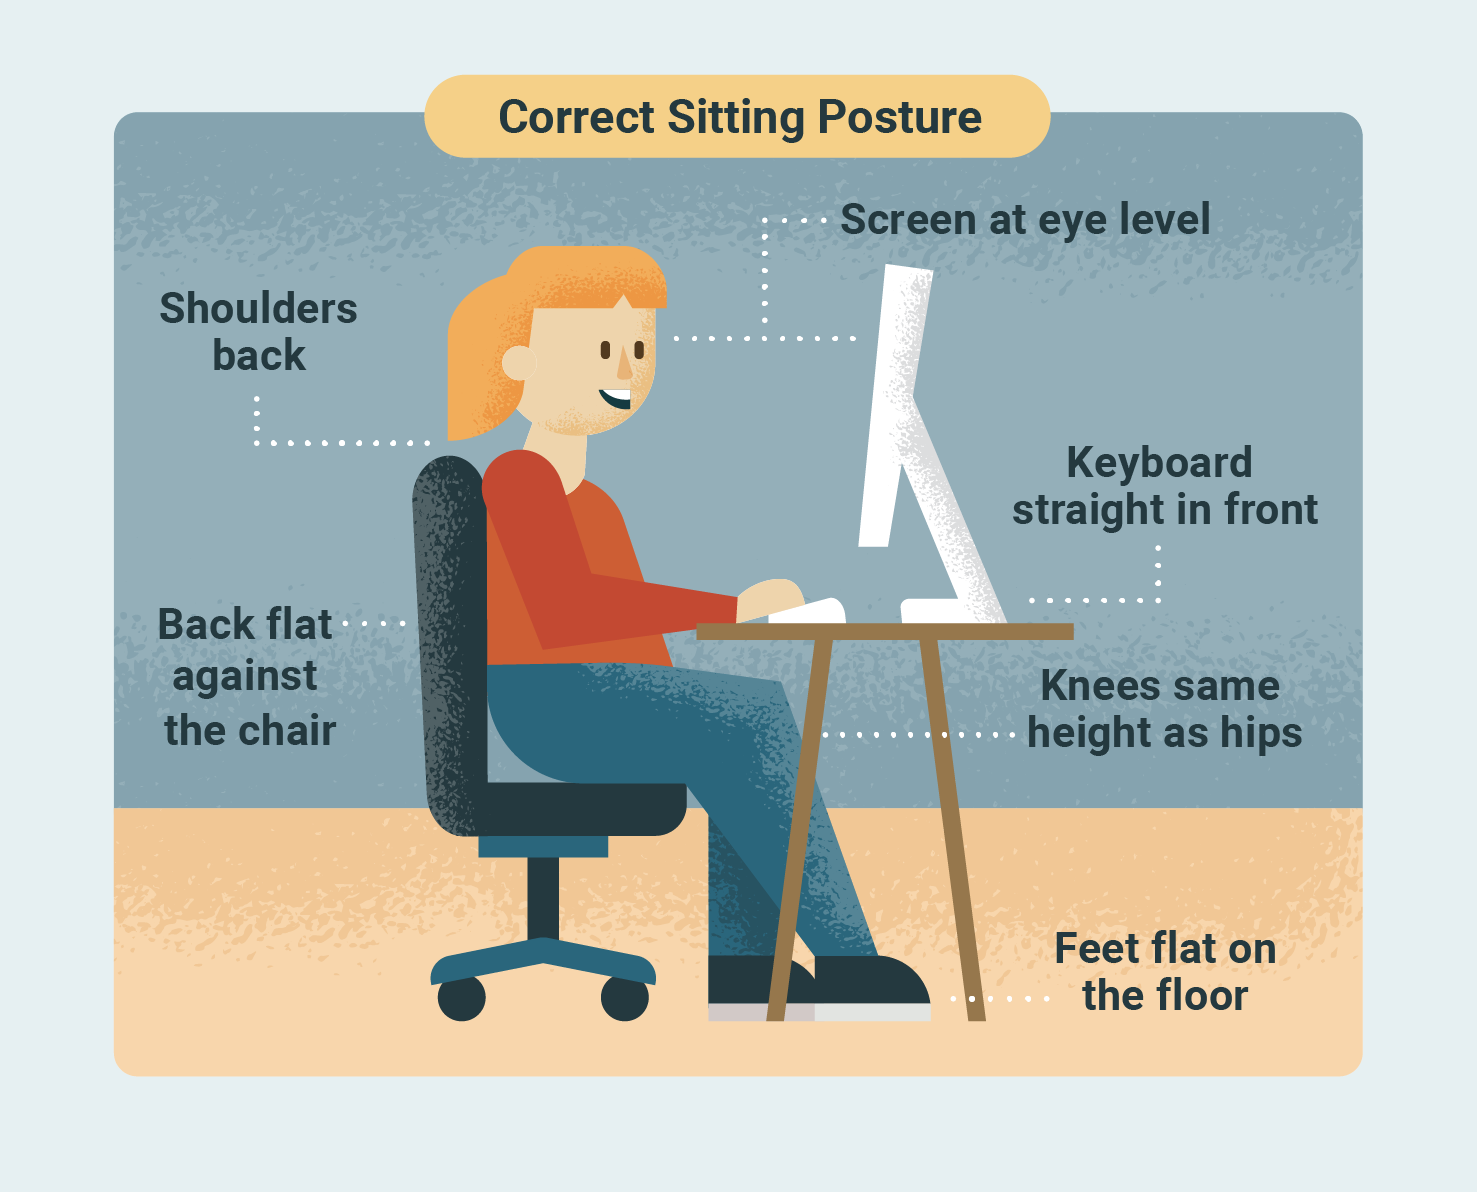 illustration correct sitting posture